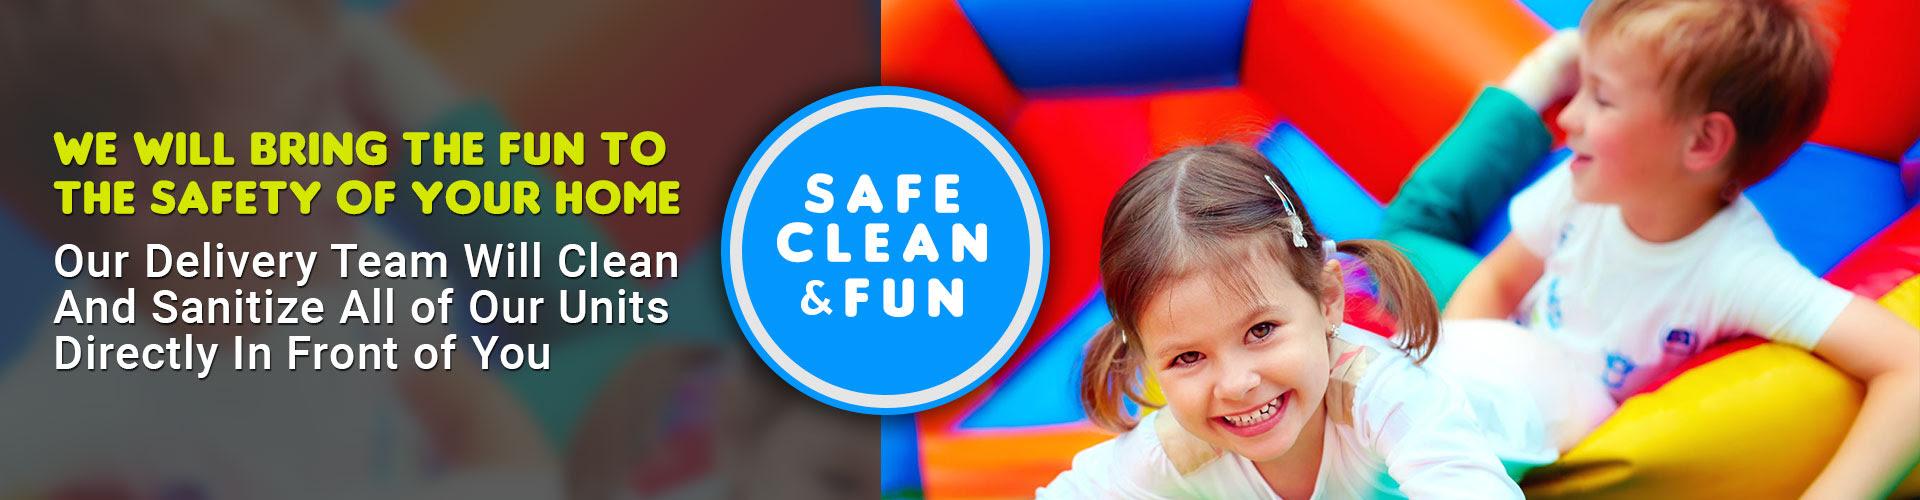 Safe, Clean Moonwalk Rentals in Cypress TX